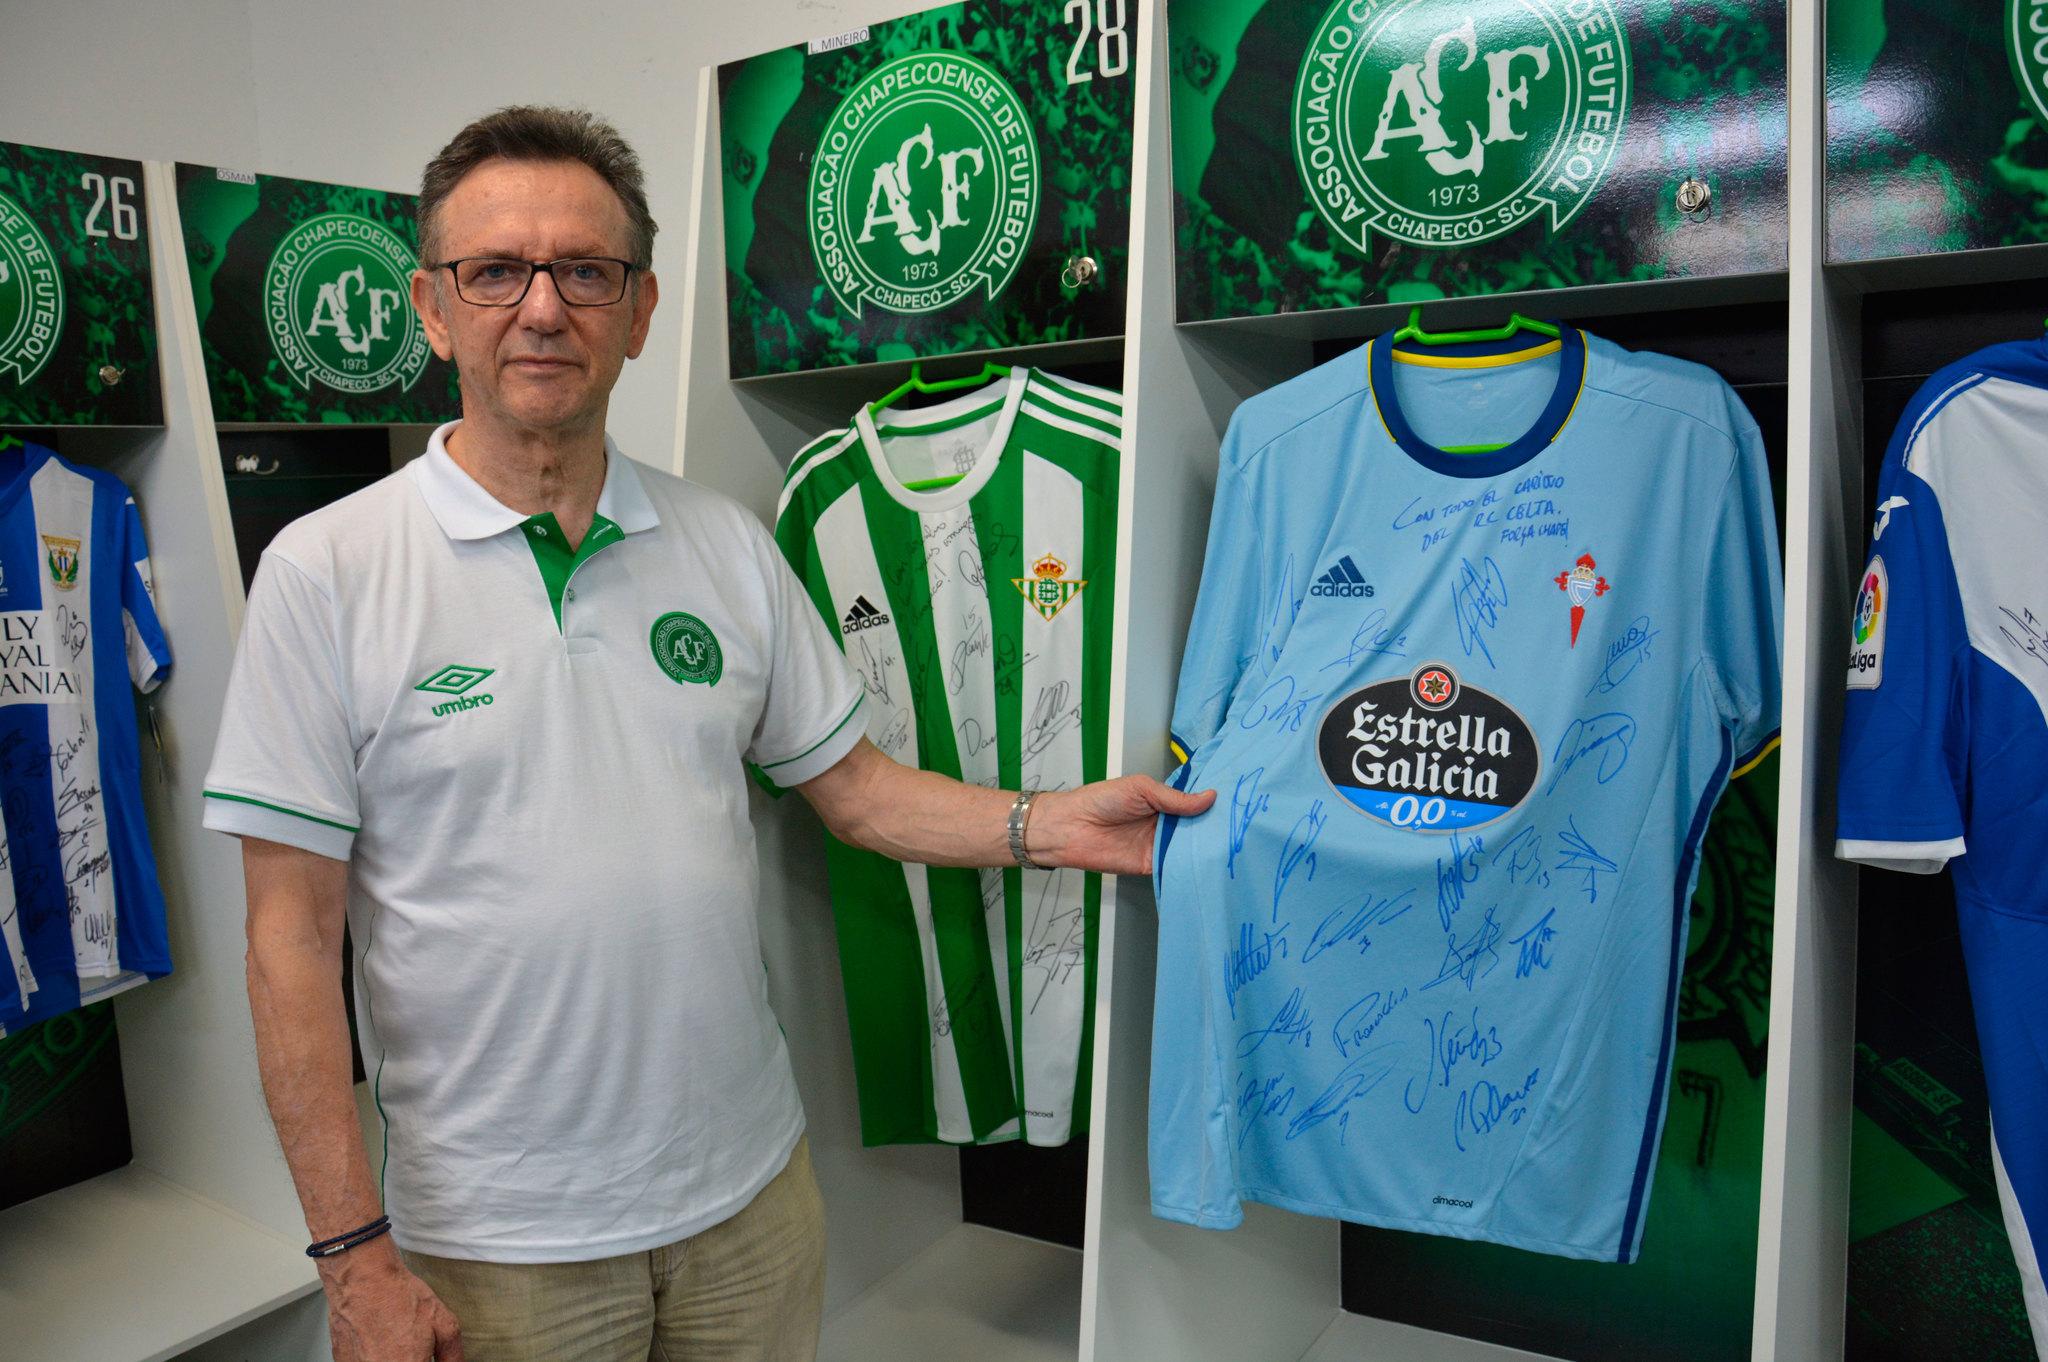 Des Neves toca la camiseta del Celta en el vestuario del Chapecoense.